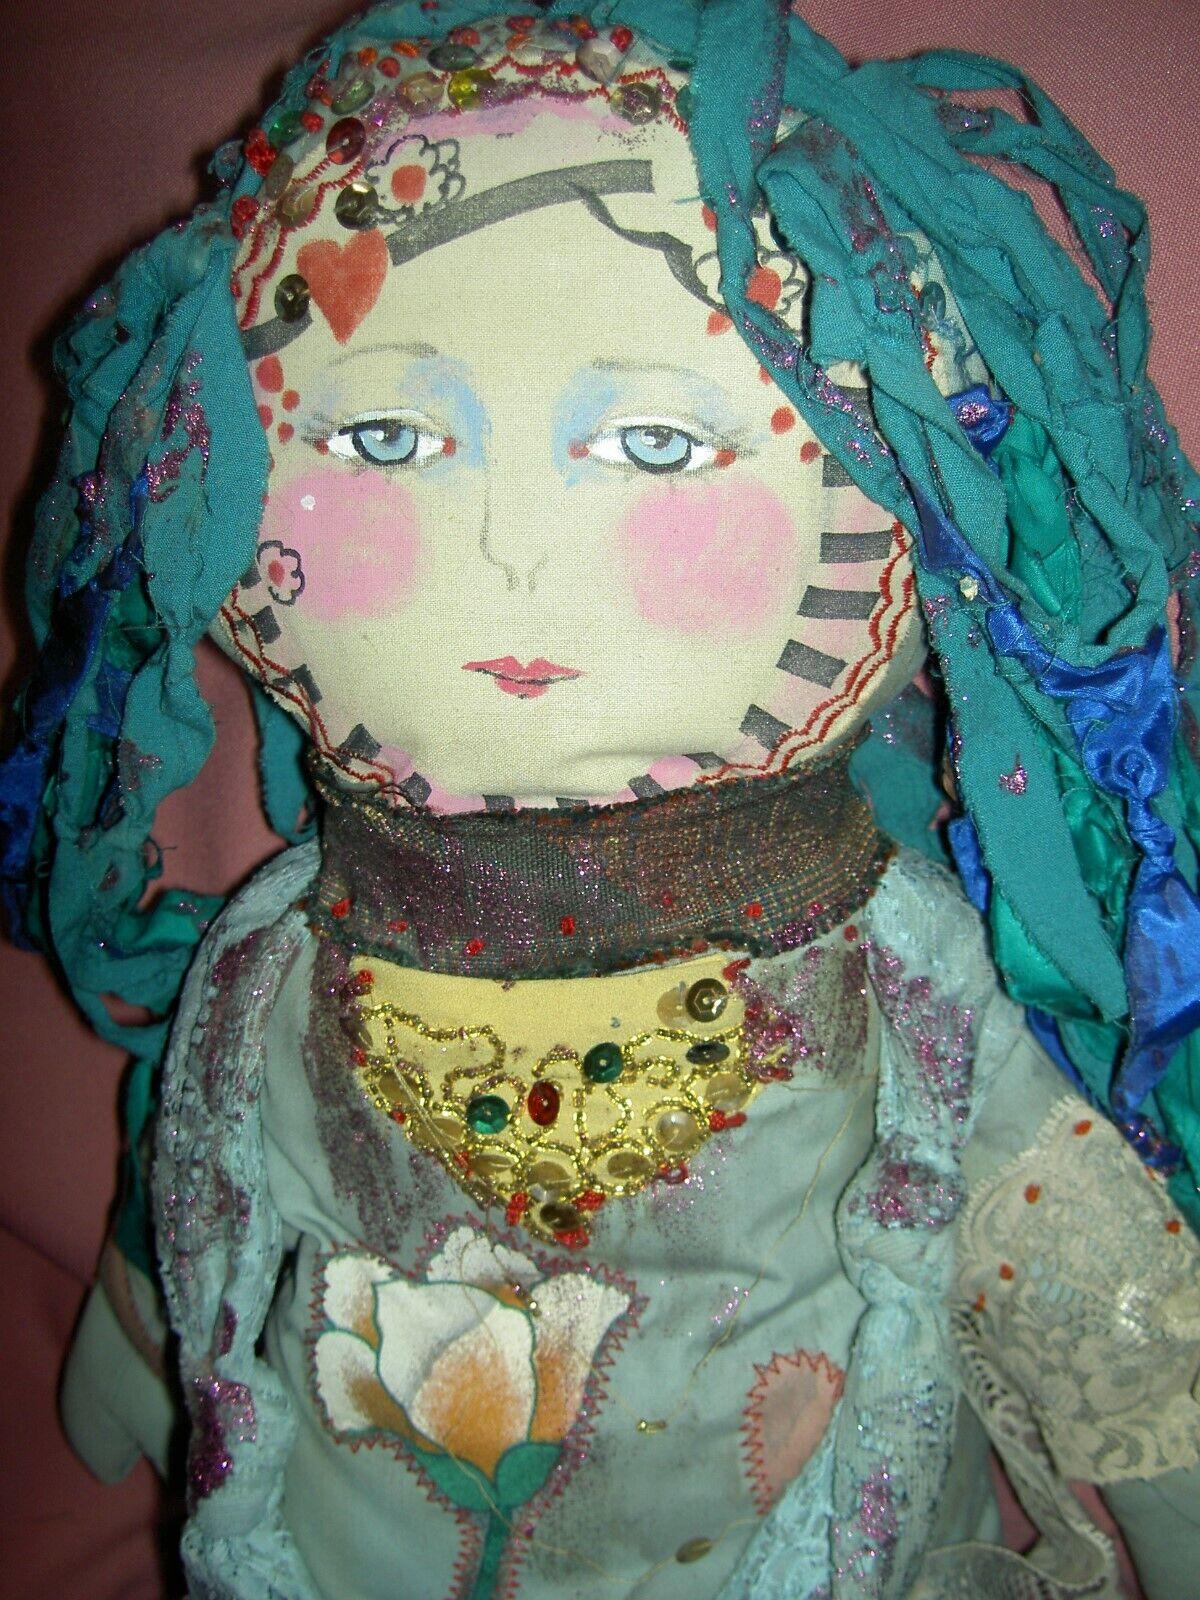 Uno de una clase 1988 Malerich firmado, mezclado textiles Tela 29  Boudoir Arte Muñeca, Millie